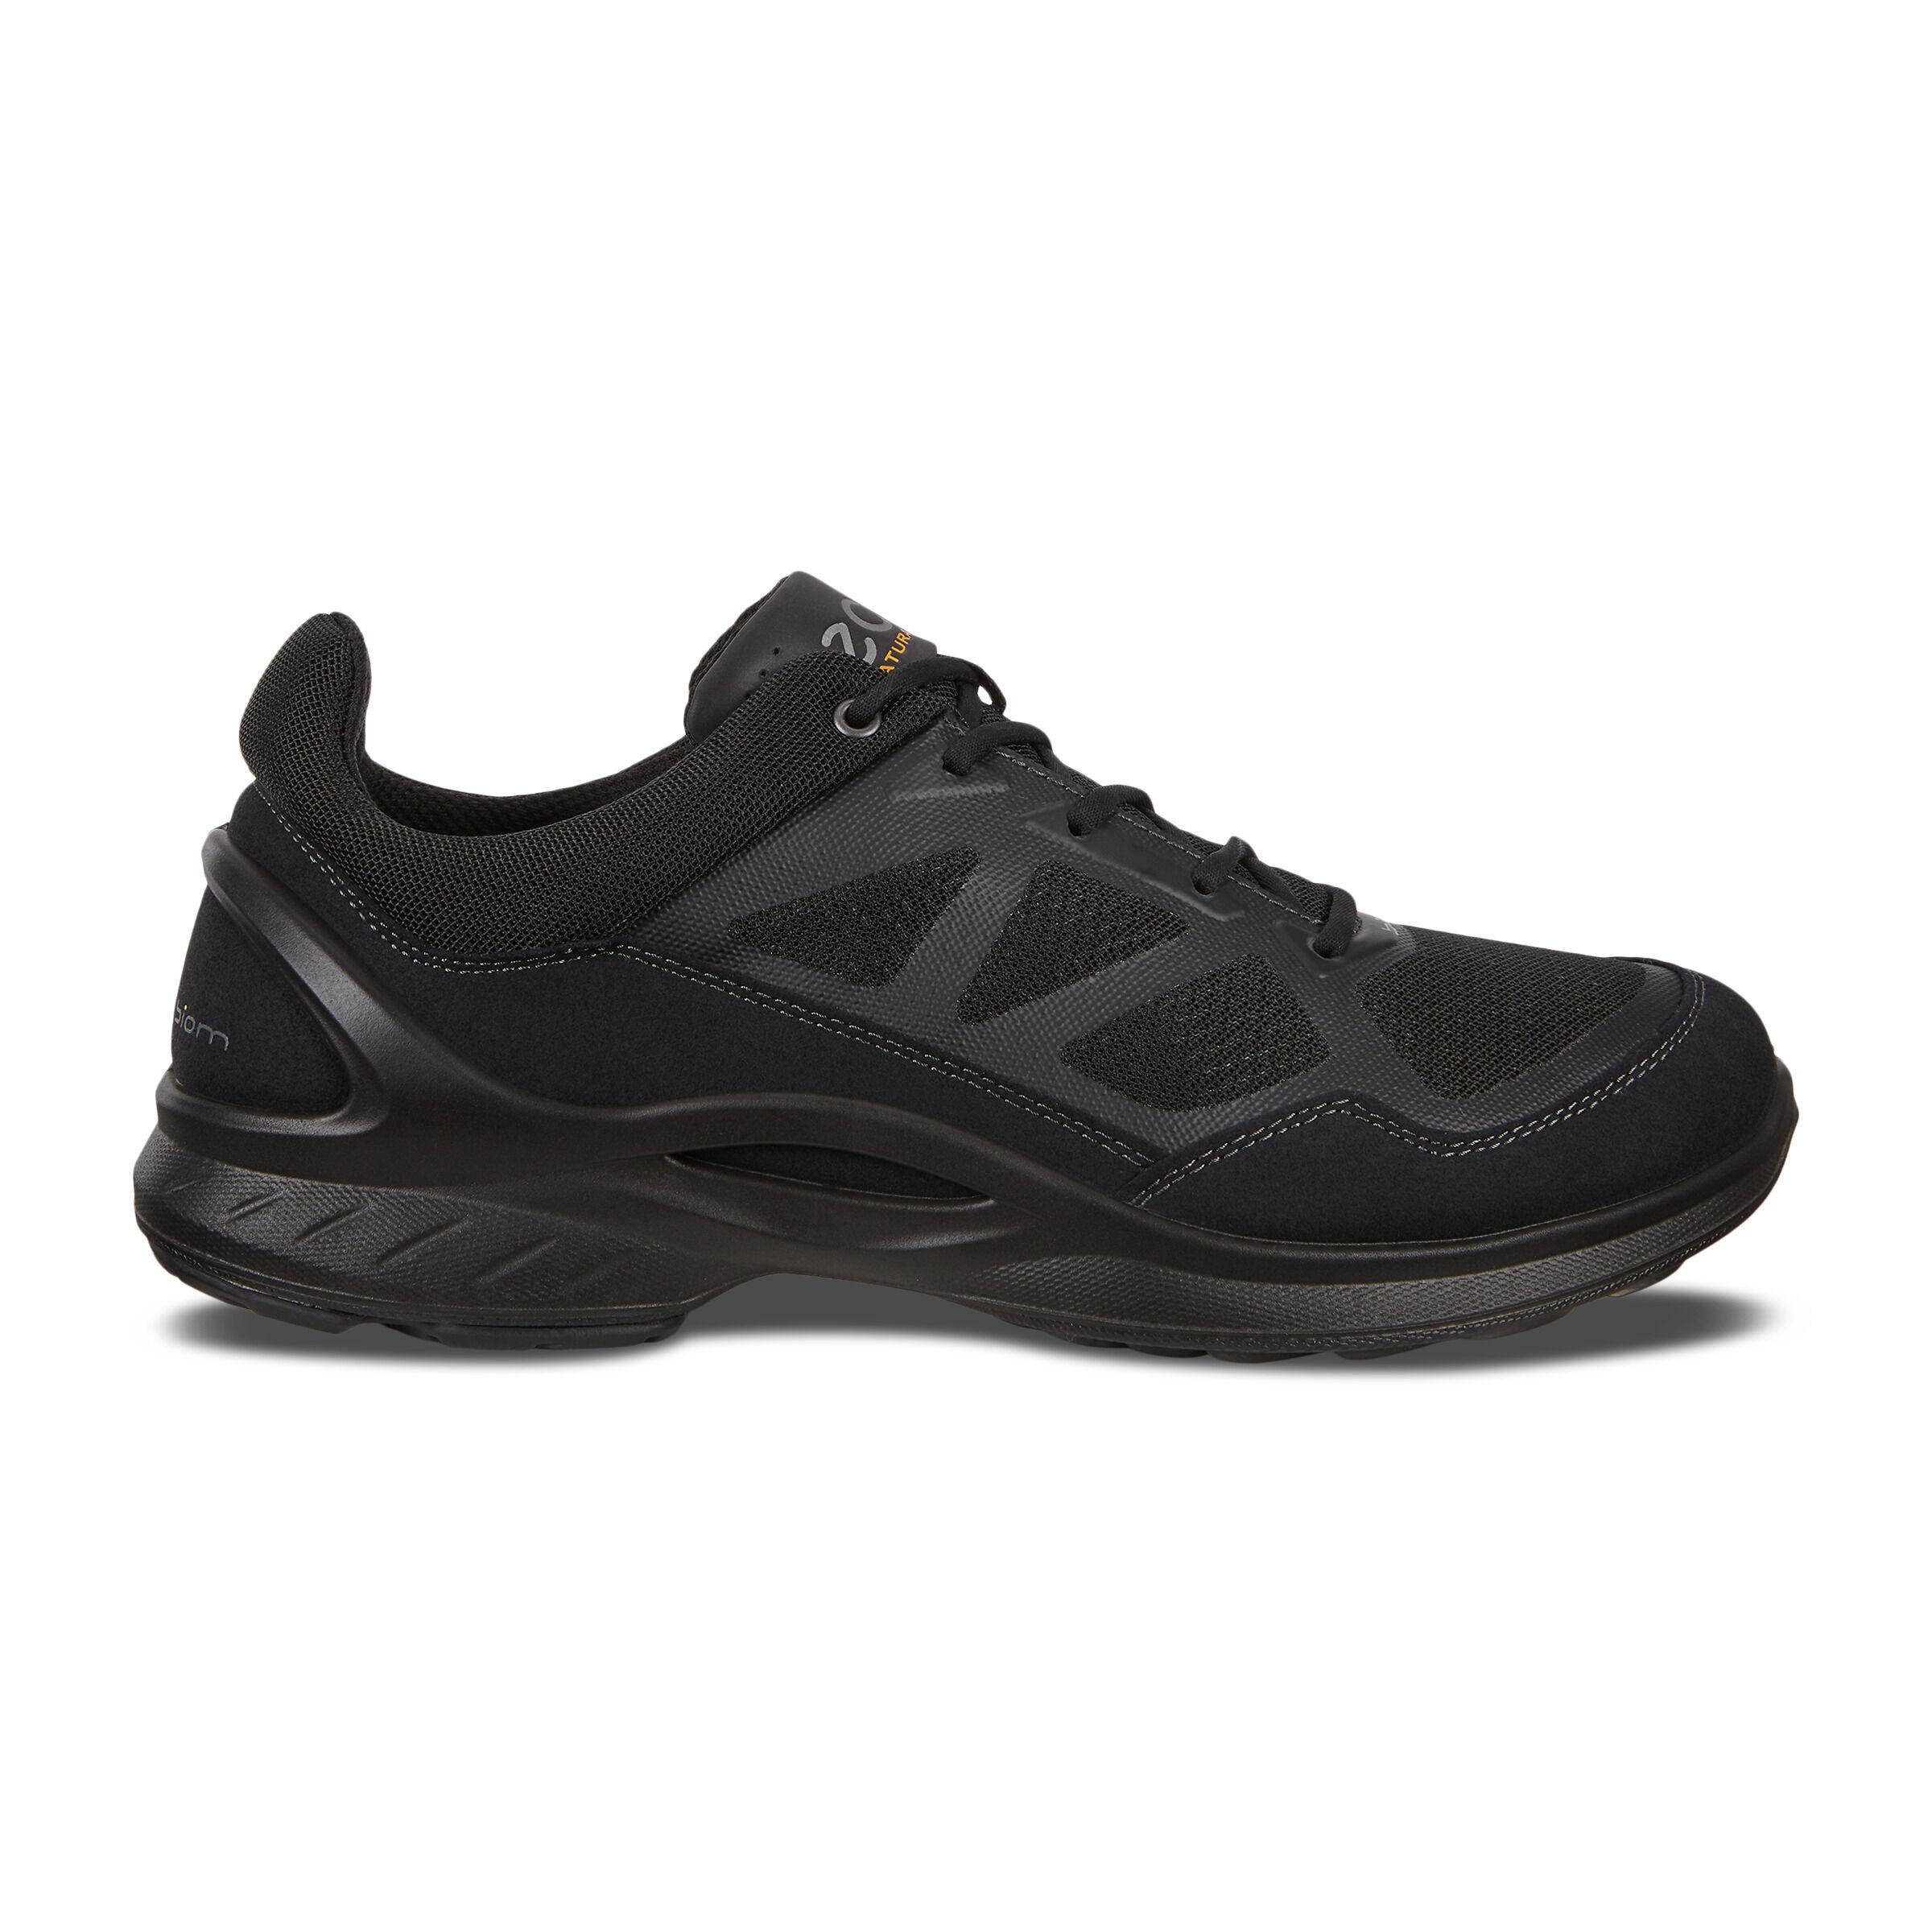 ECCO BIOM Fjuel M Outdoor Shoe Sneakers Size 10/10.5 Black